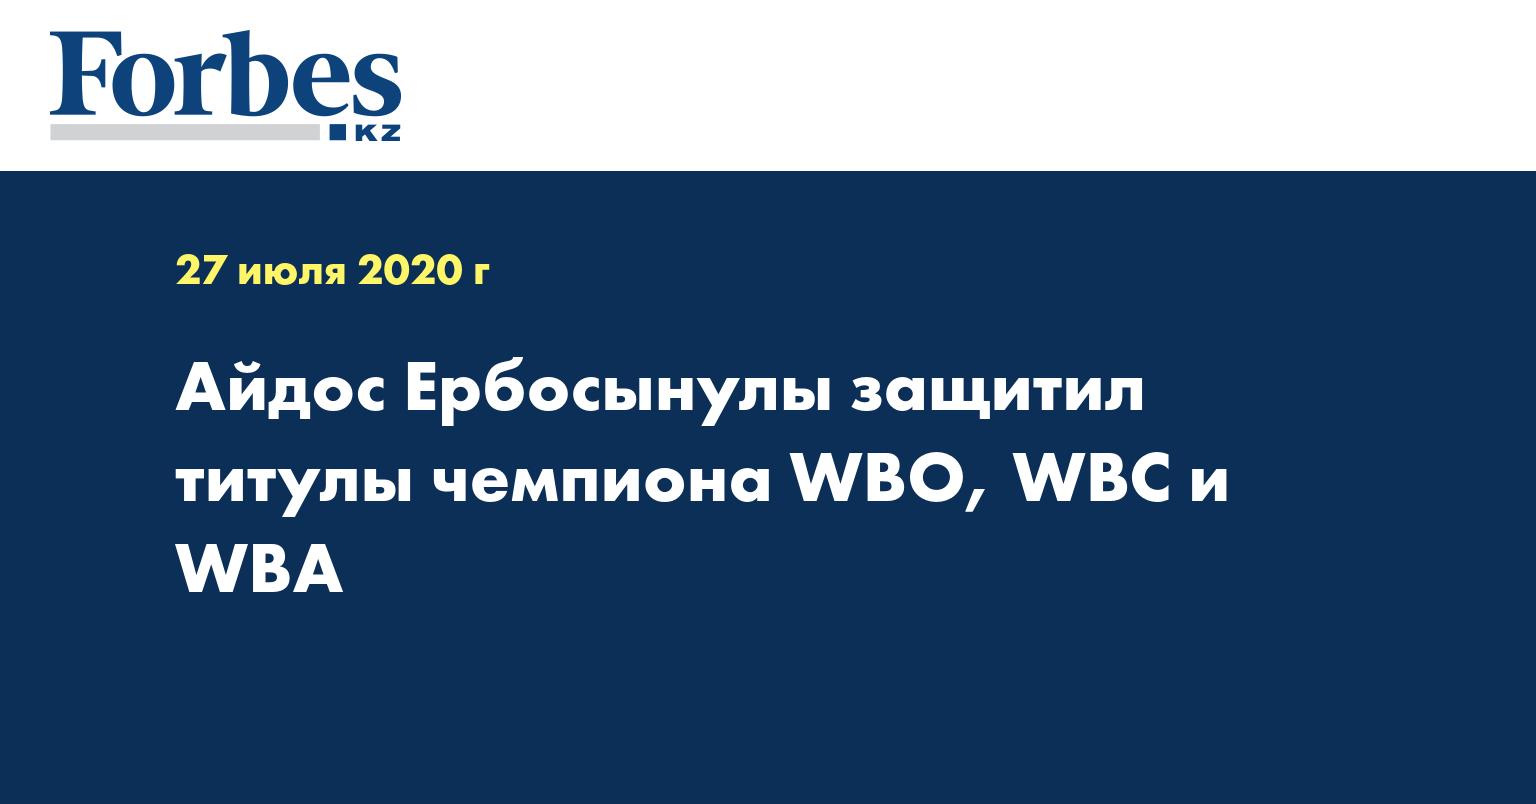 Айдос Ербосынулы защитил титулы чемпиона WBO, WBC и WBA